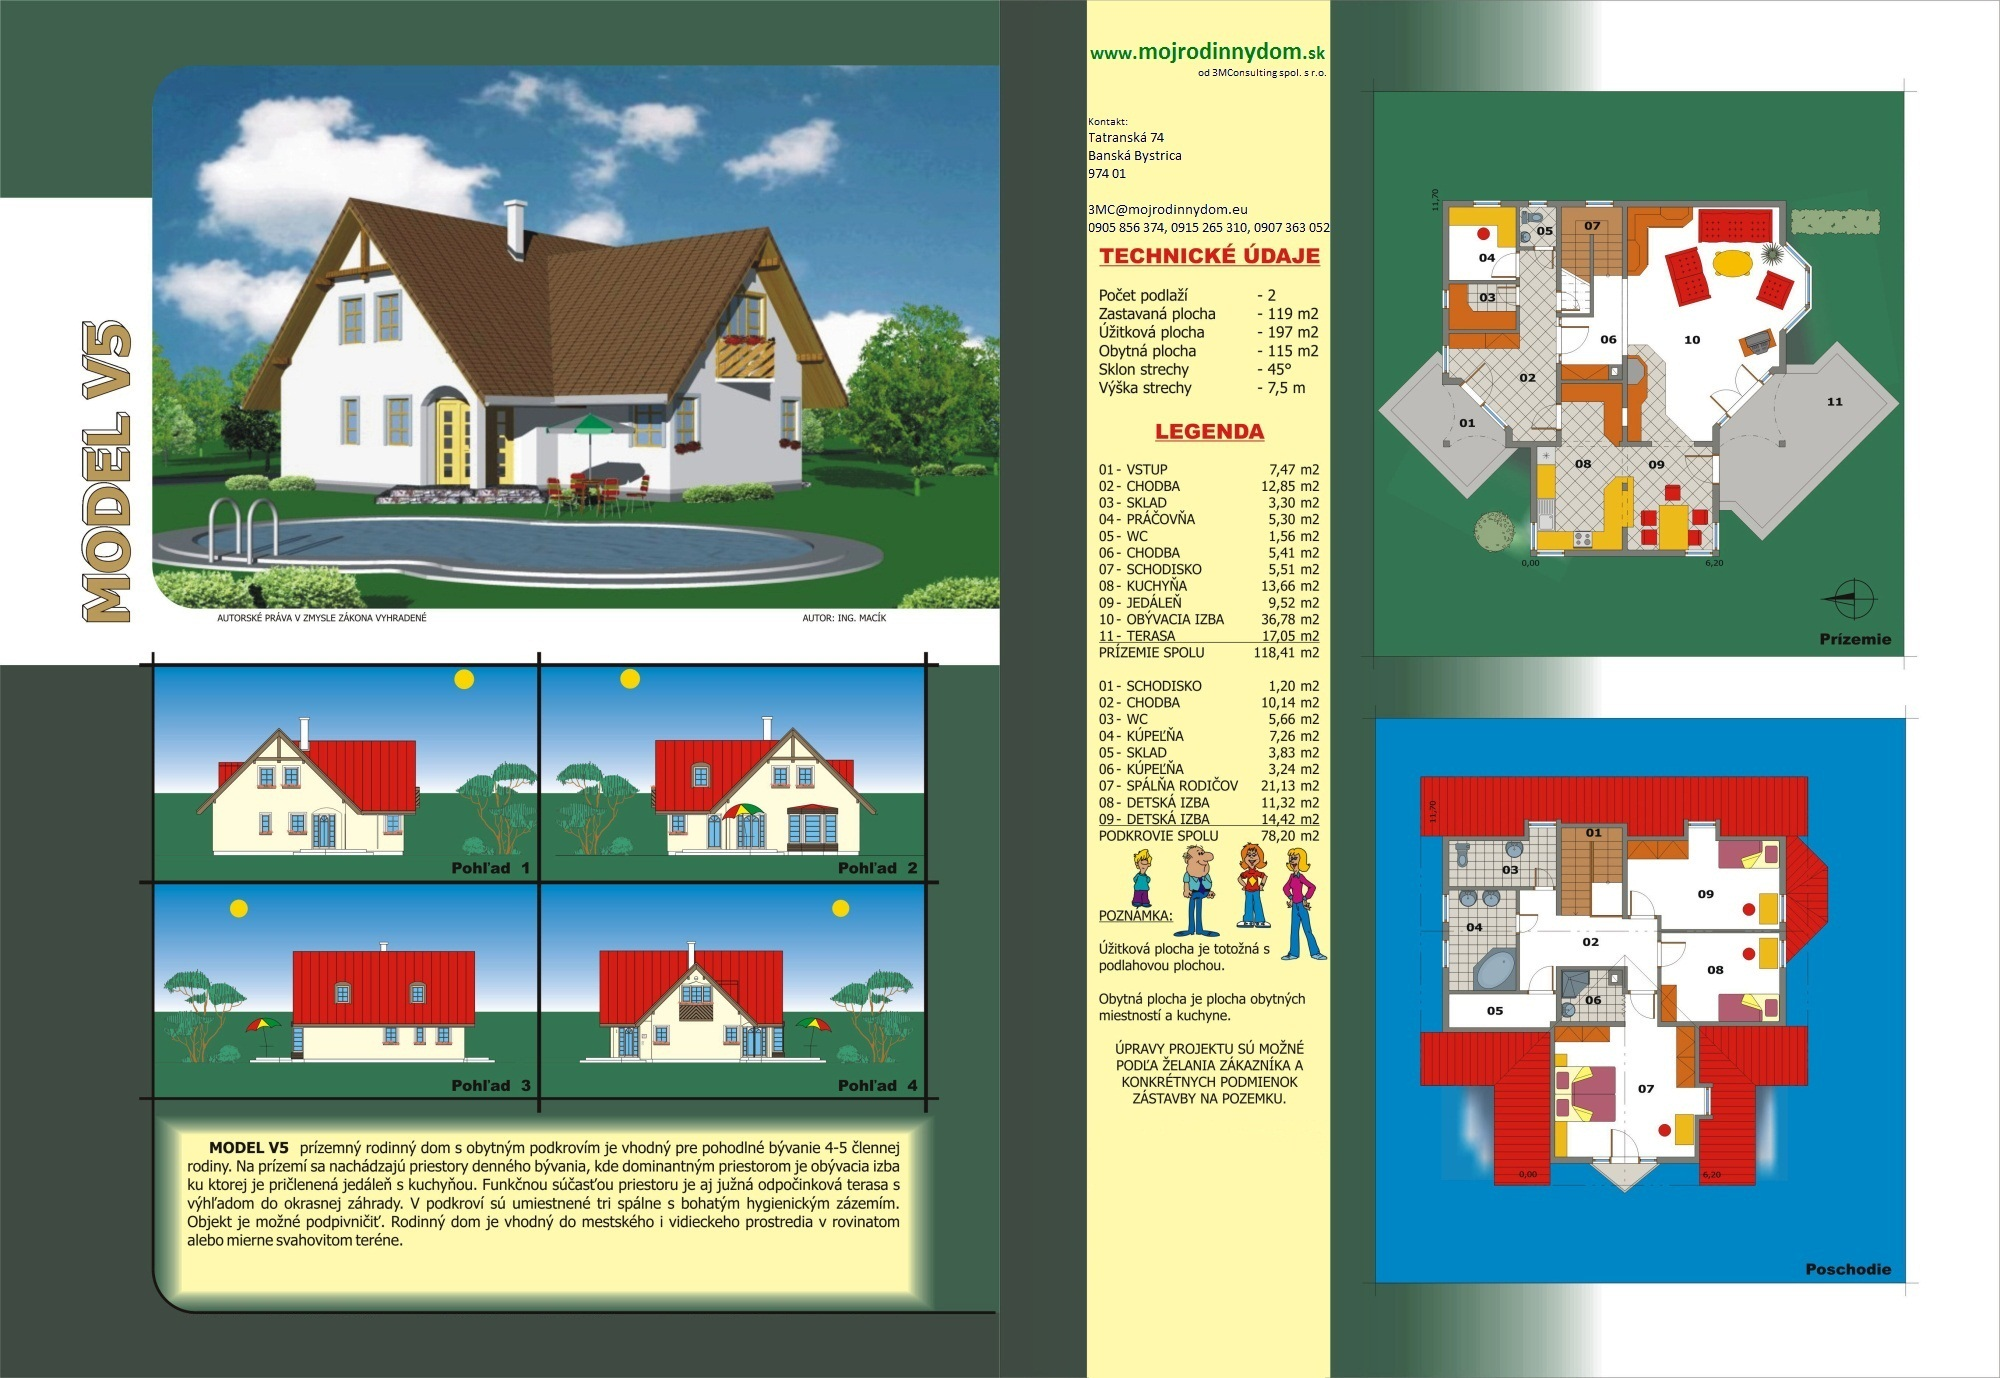 projekt veľkého rodinného domu xv5